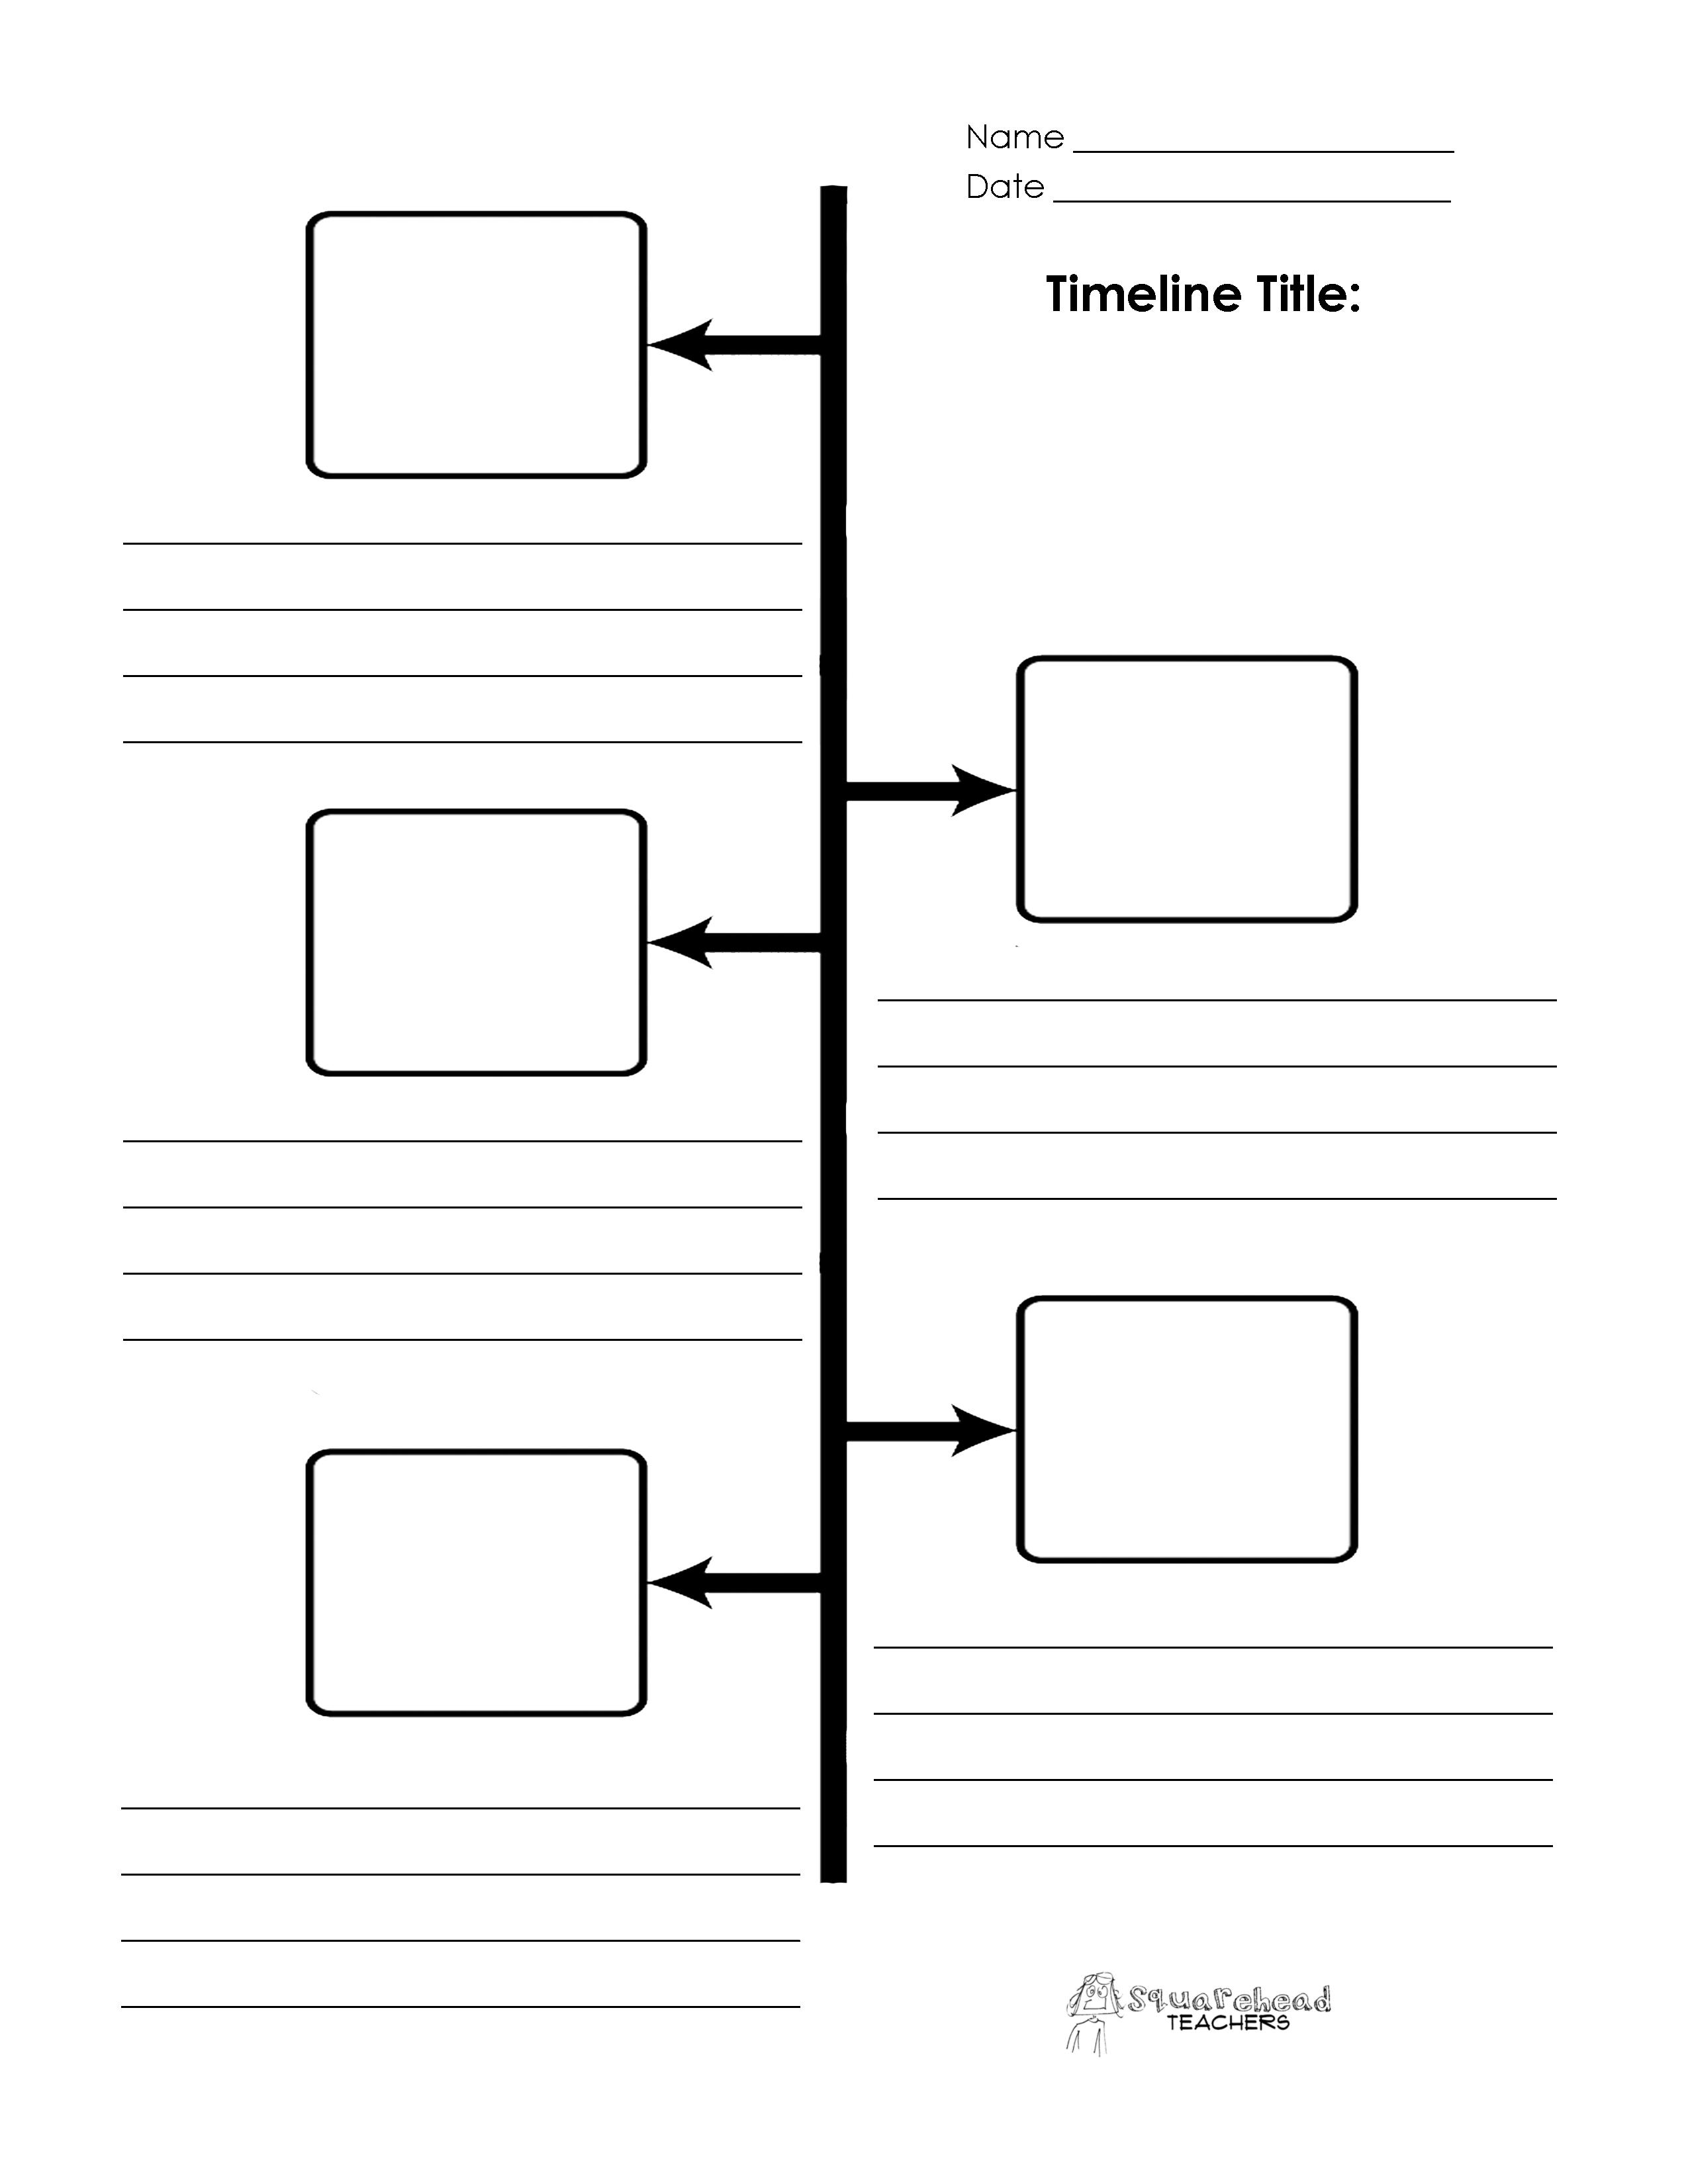 graphic regarding Printable Timeline Template identify Blank Timeline Printables Squarehead Instructors